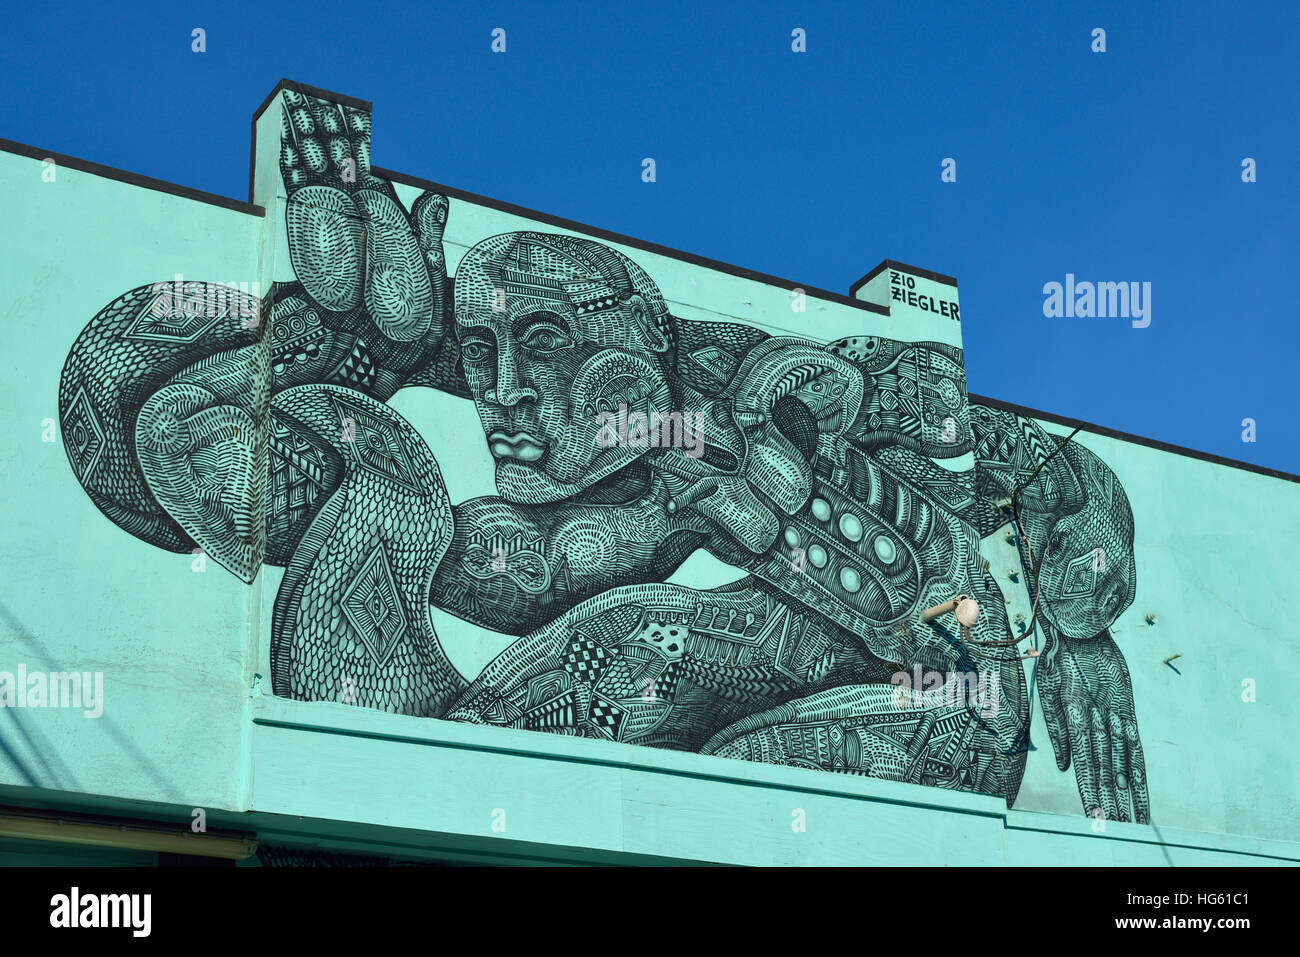 Warrior Surfer Memorial, Outer Sunset, San Francisco CA Stock Photo